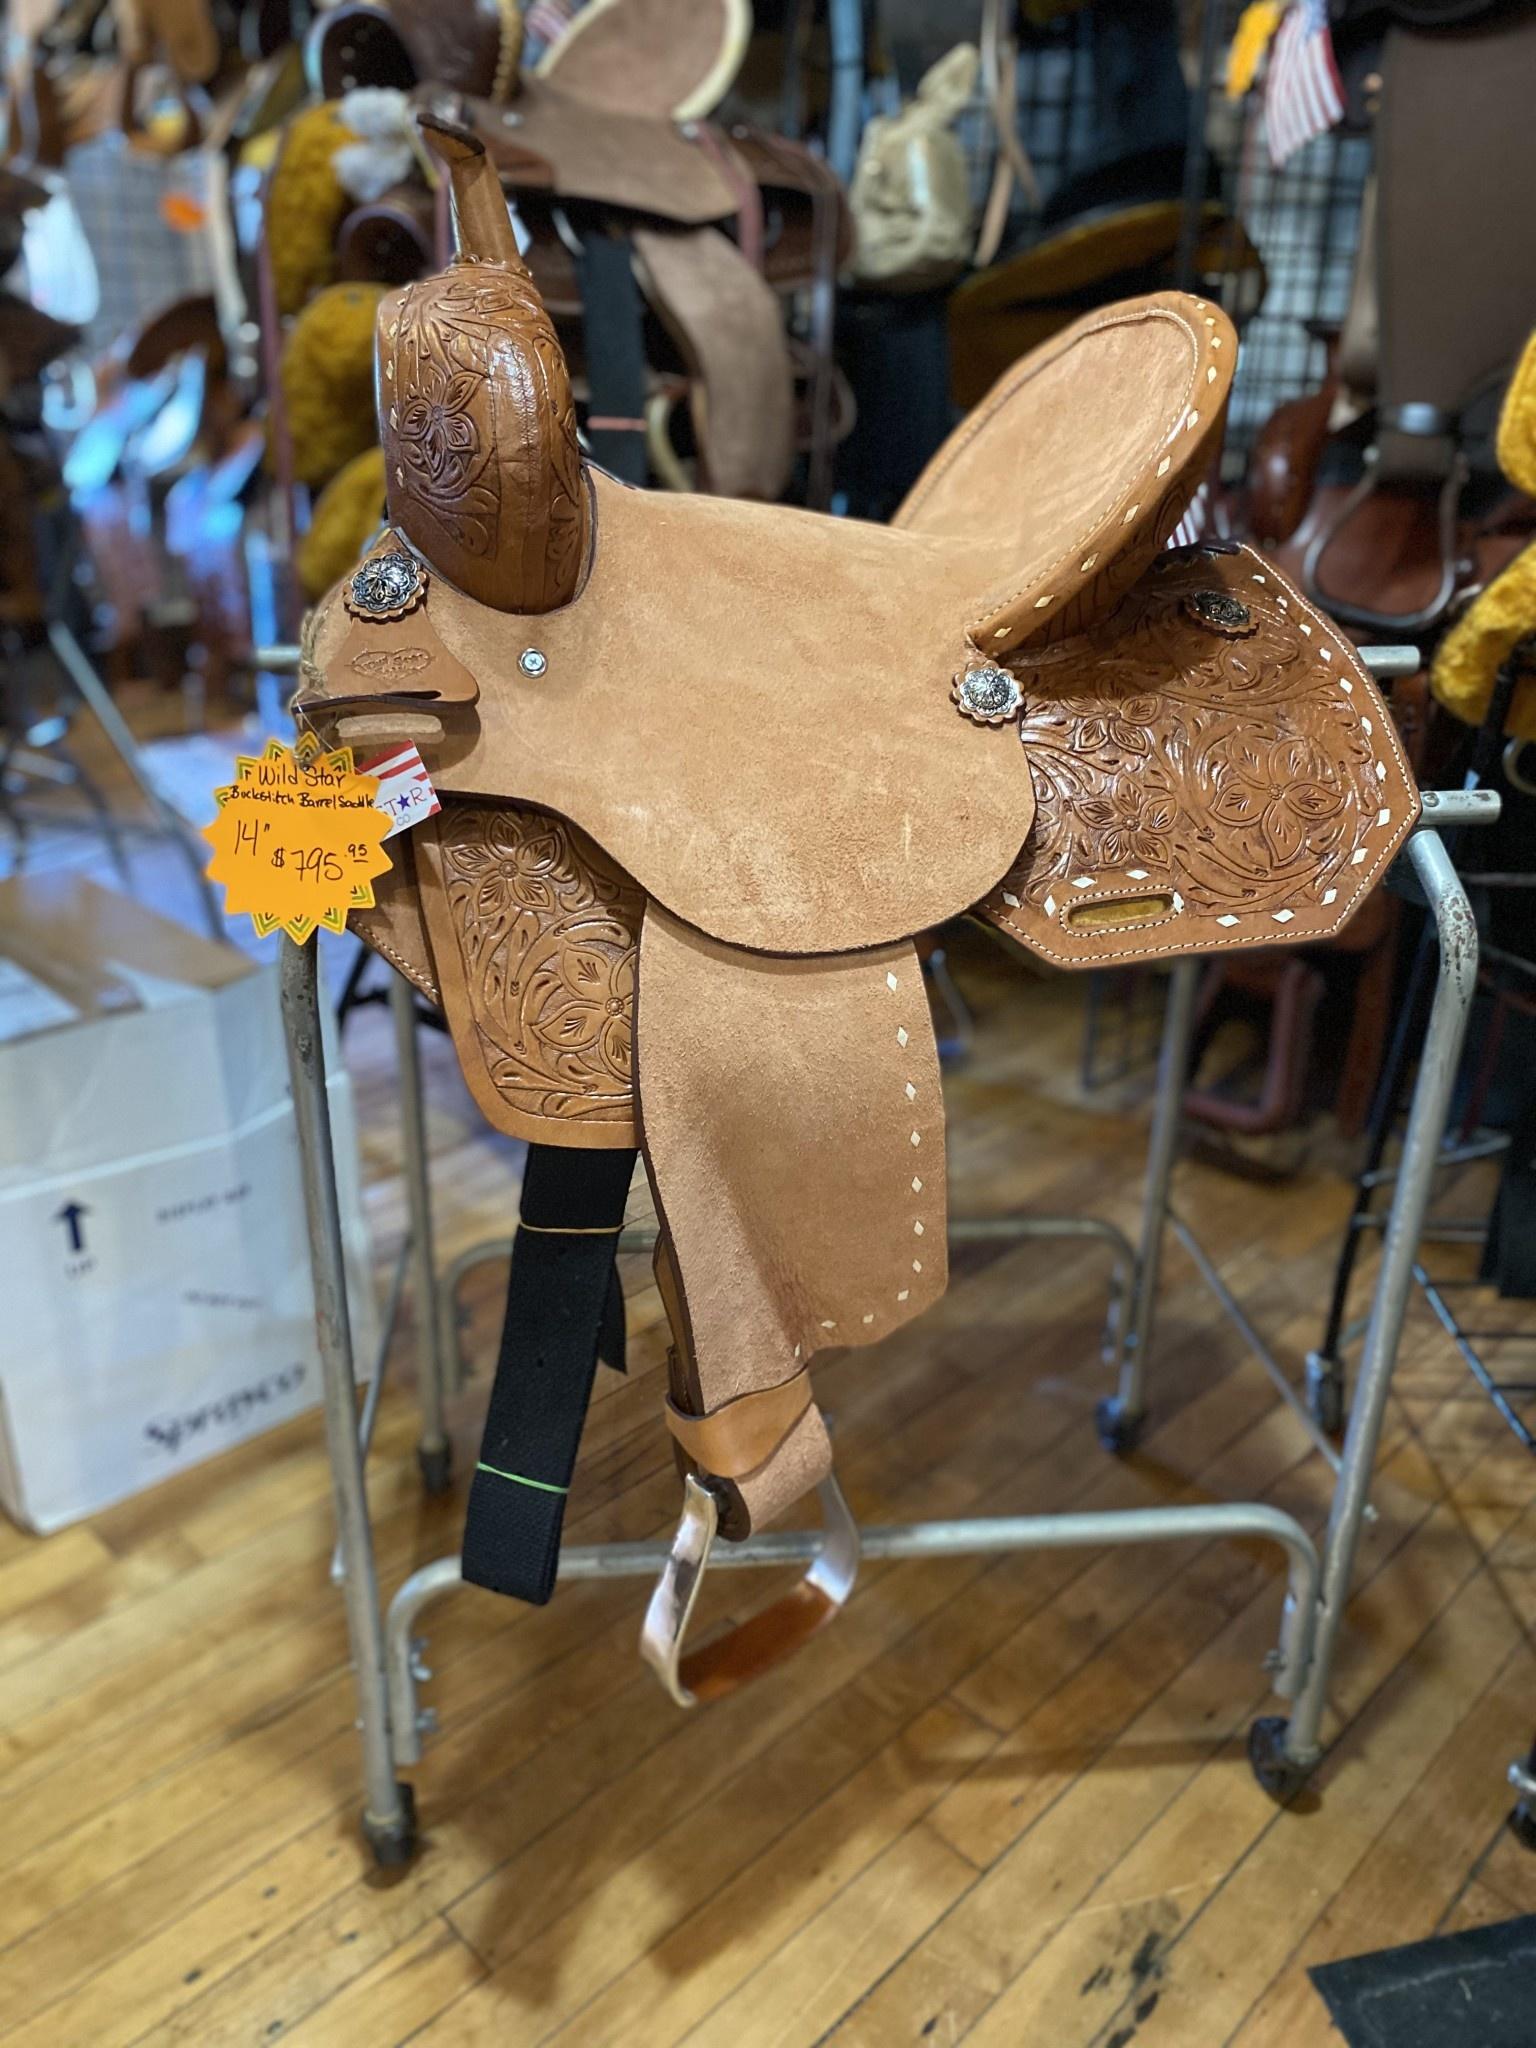 "14"" Wild Star Buckstitch Barrel Saddle - Inlay Seat"